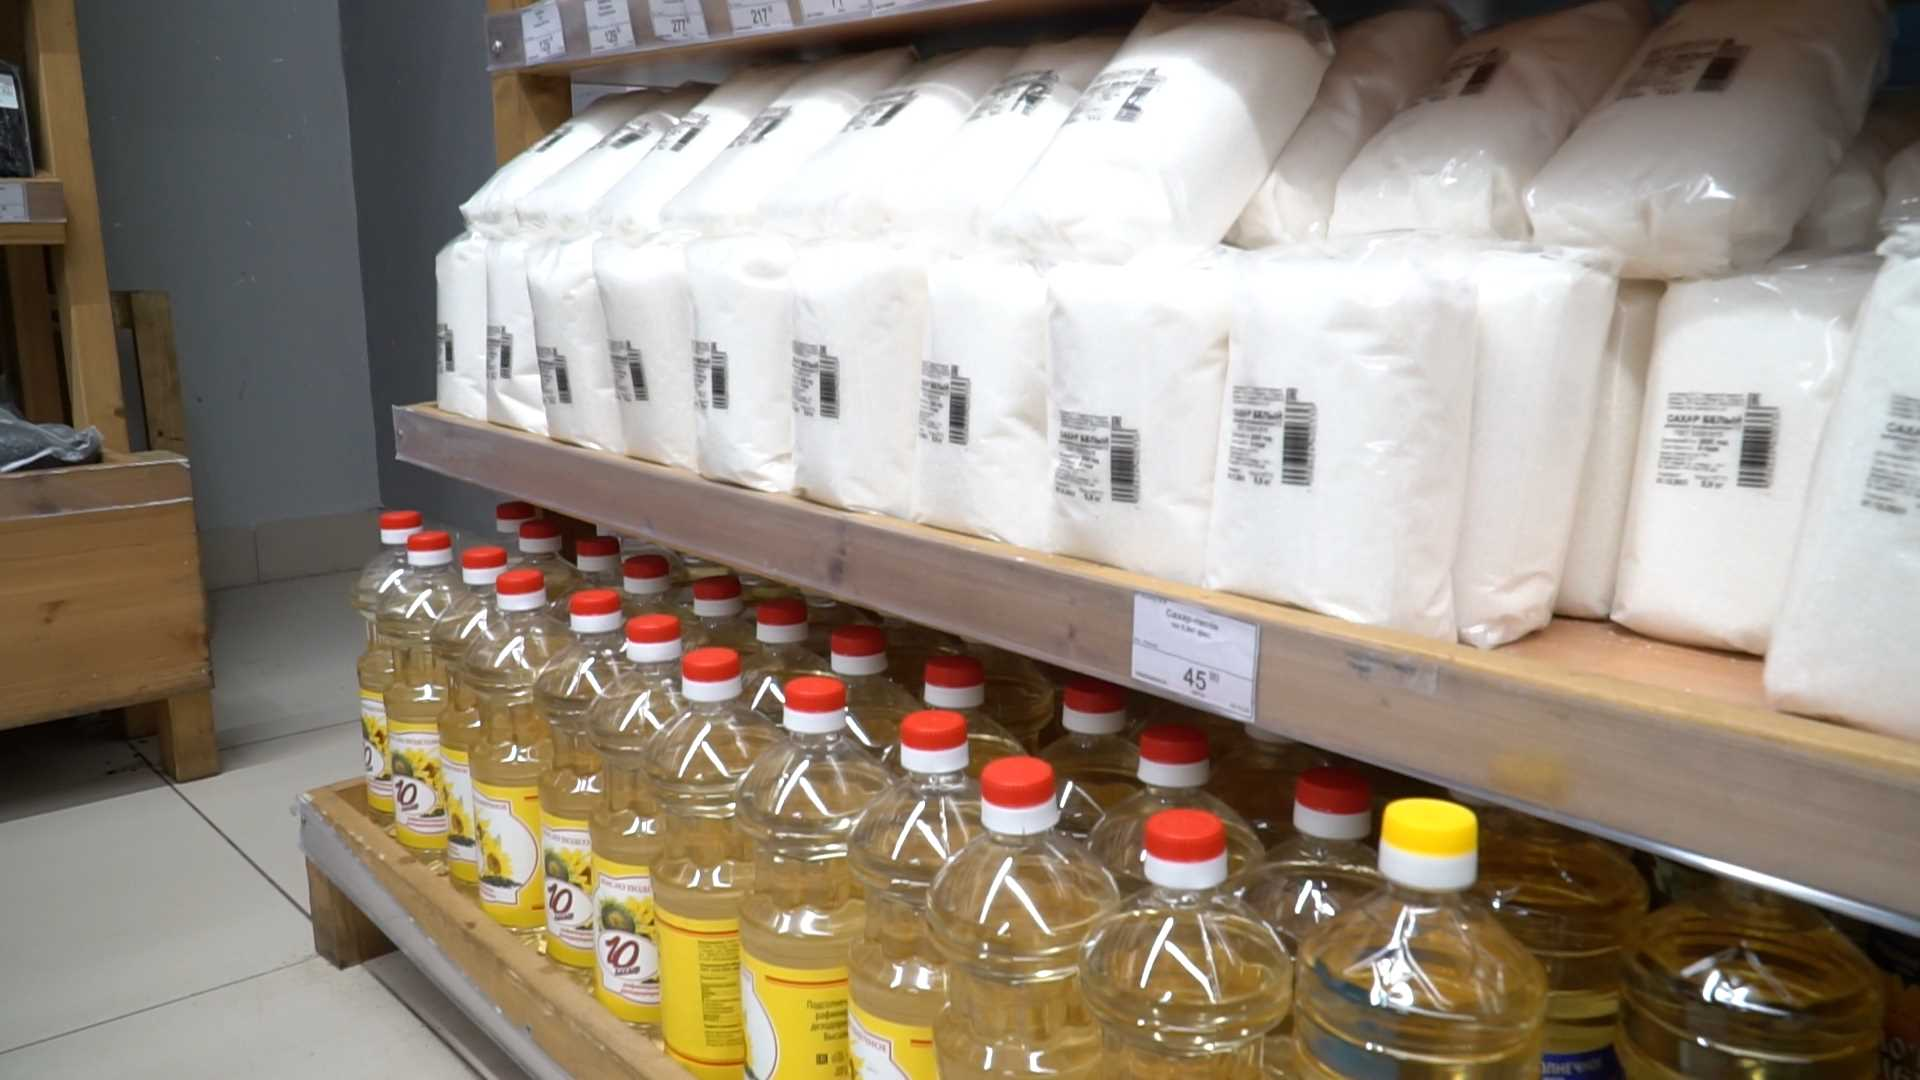 Сахар и масло в костромских магазинах начали дешеветь